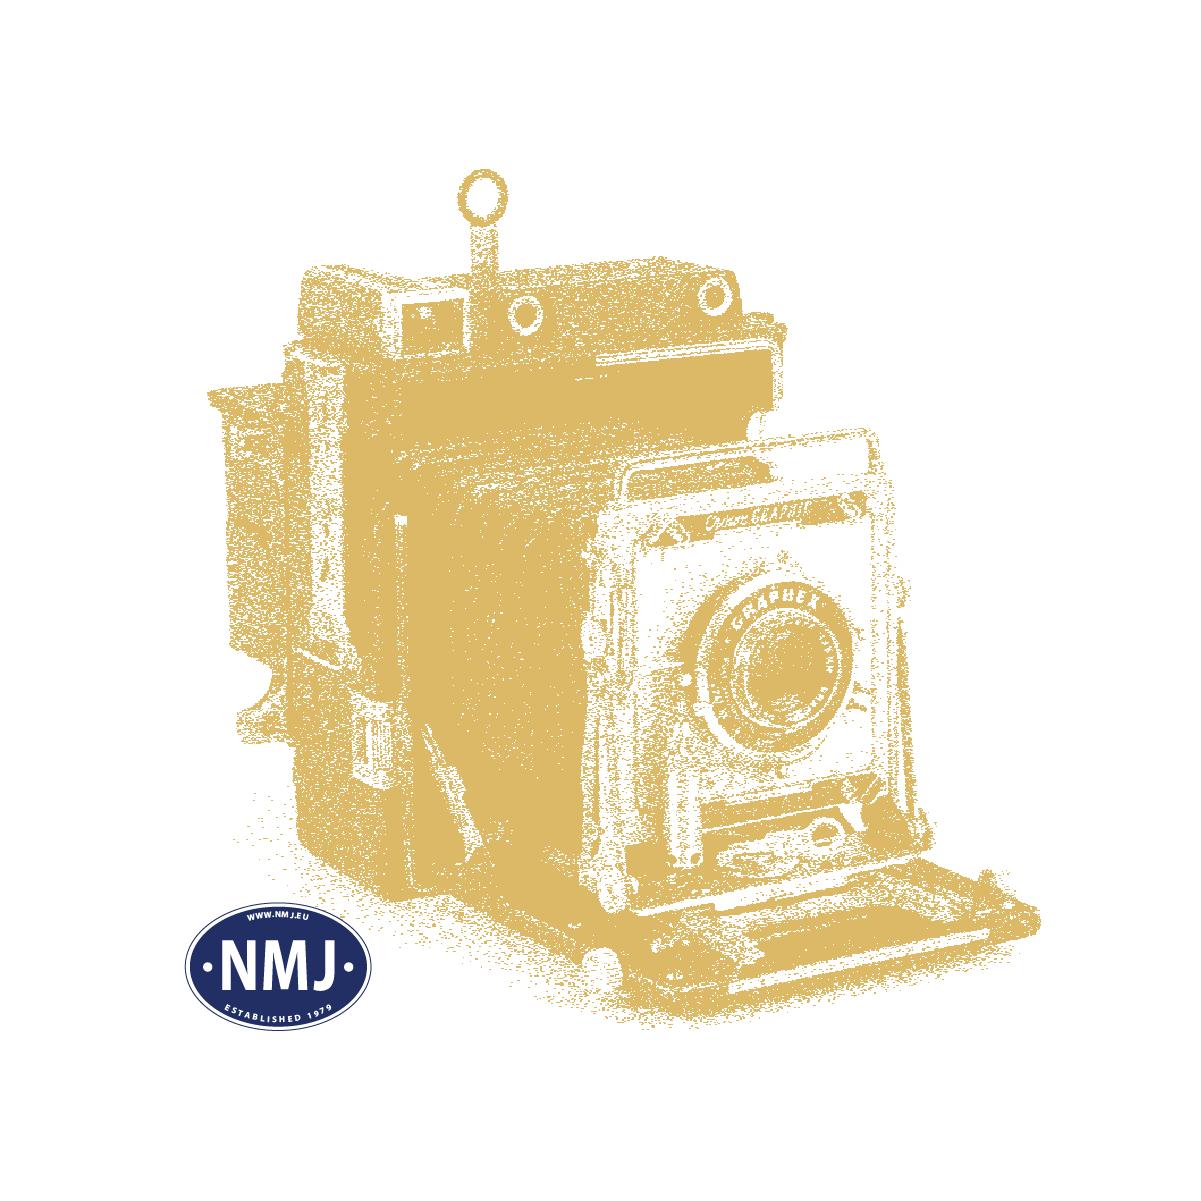 NMJT132.302 - NMJ Topline NSB CB3 21233, Nydesign